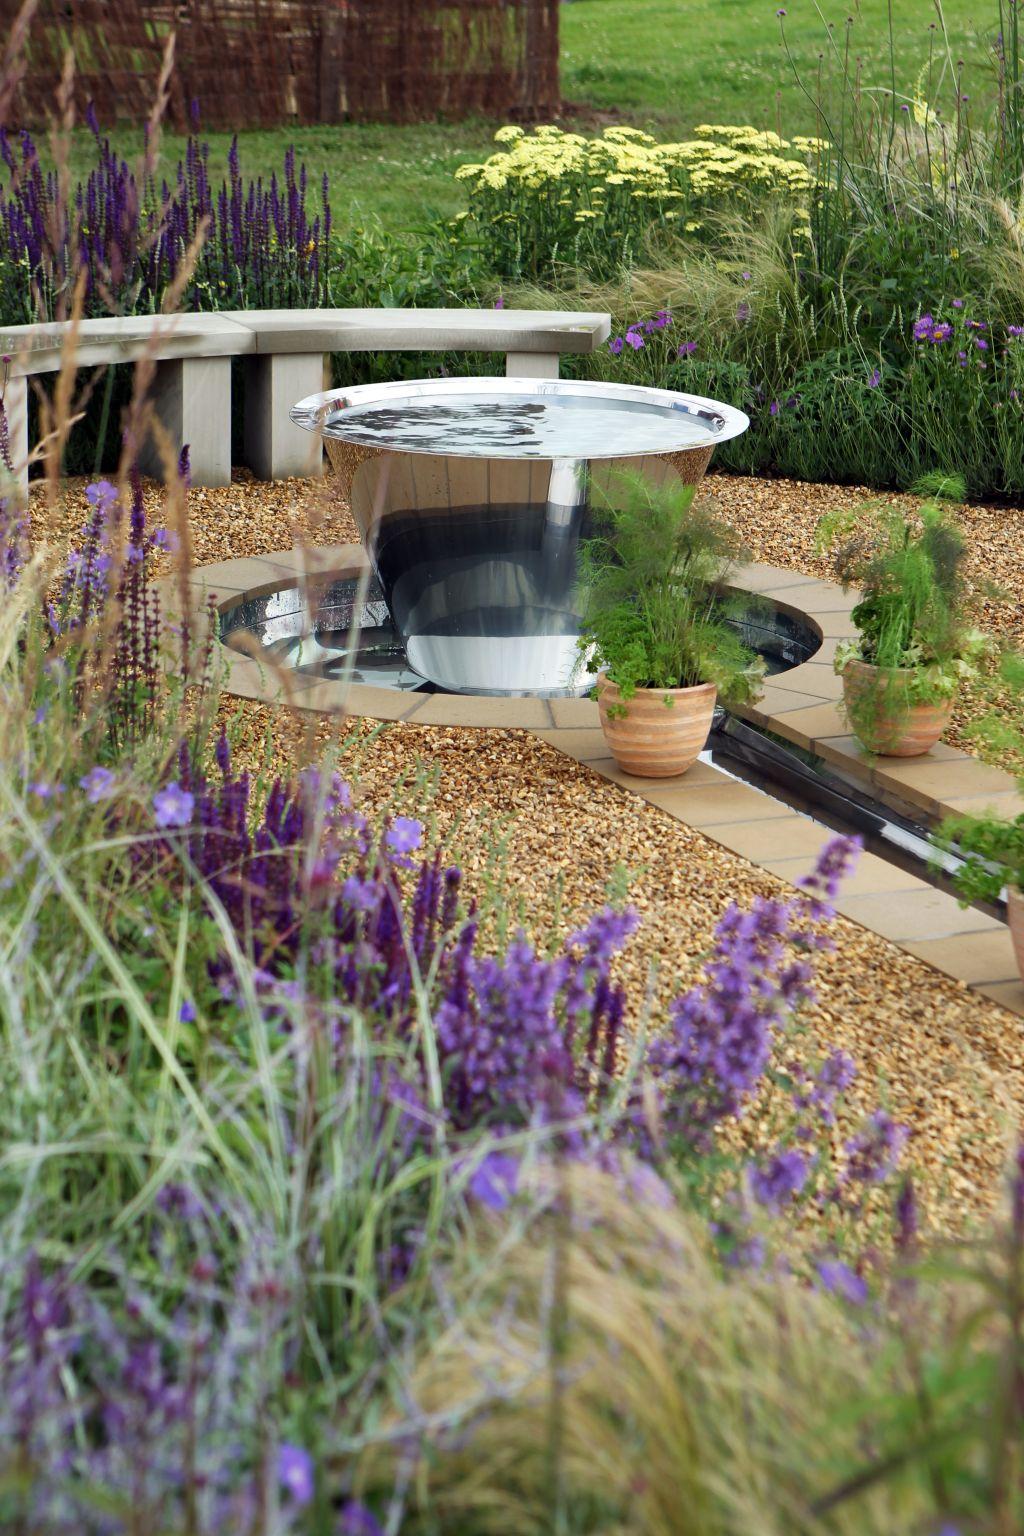 Potrivire perfecta in gradina, proiect de Harry's Gold Stars la RHS Flower Show Tatton Park, Londra. Foto Andy Paradise